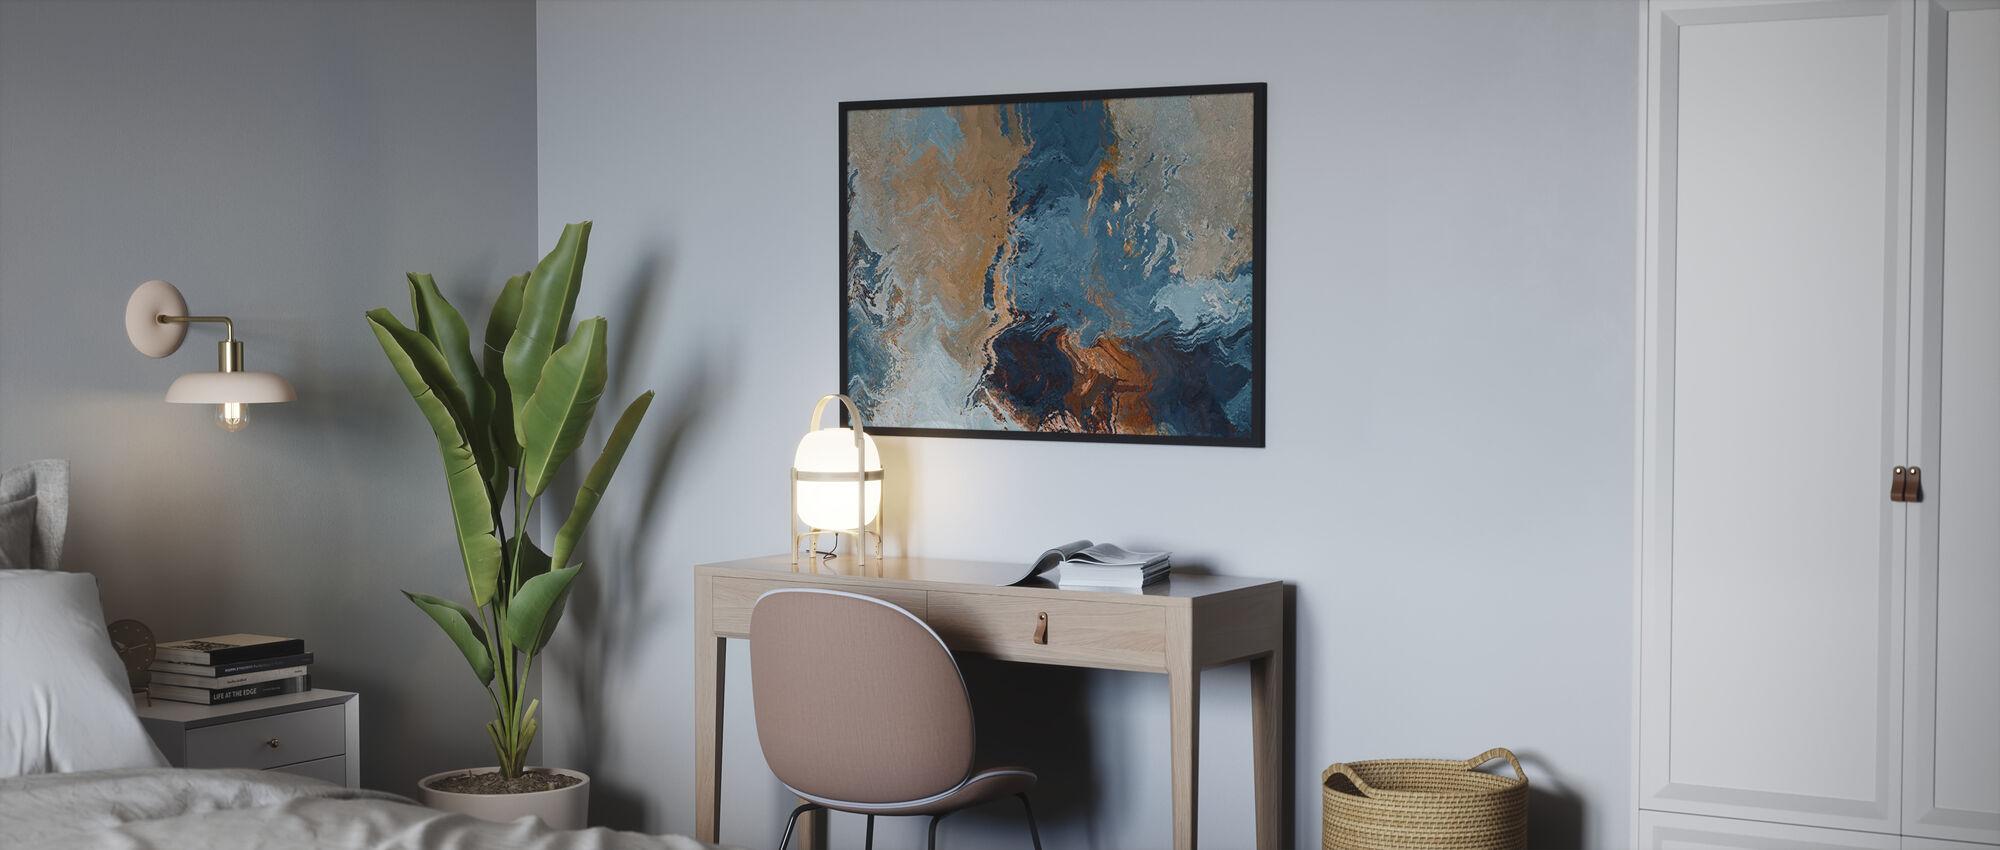 Shell - Poster - Bedroom